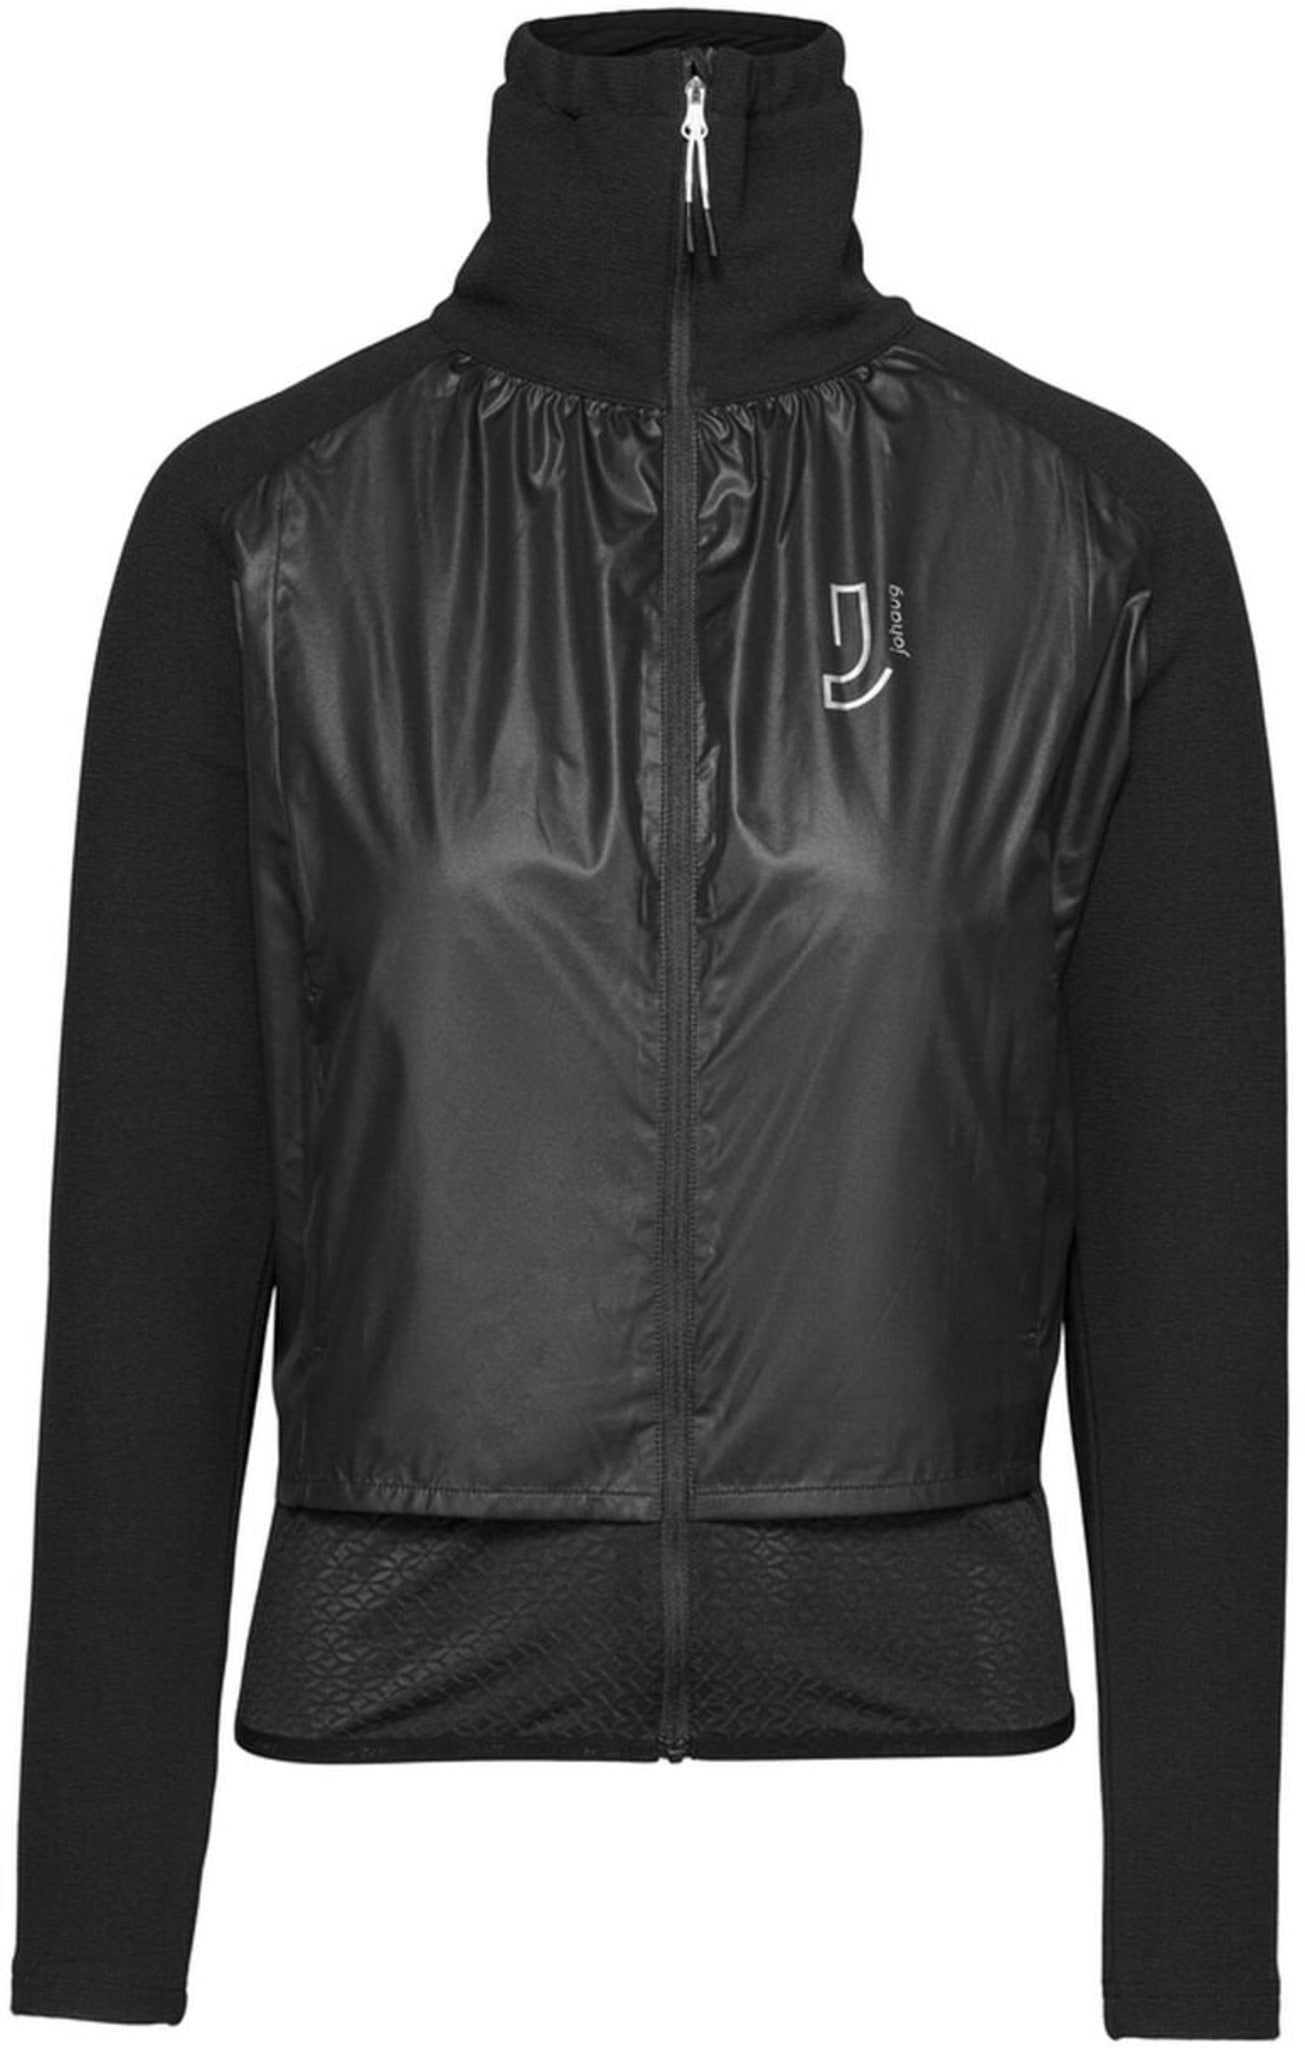 Daze Hybrid jacket